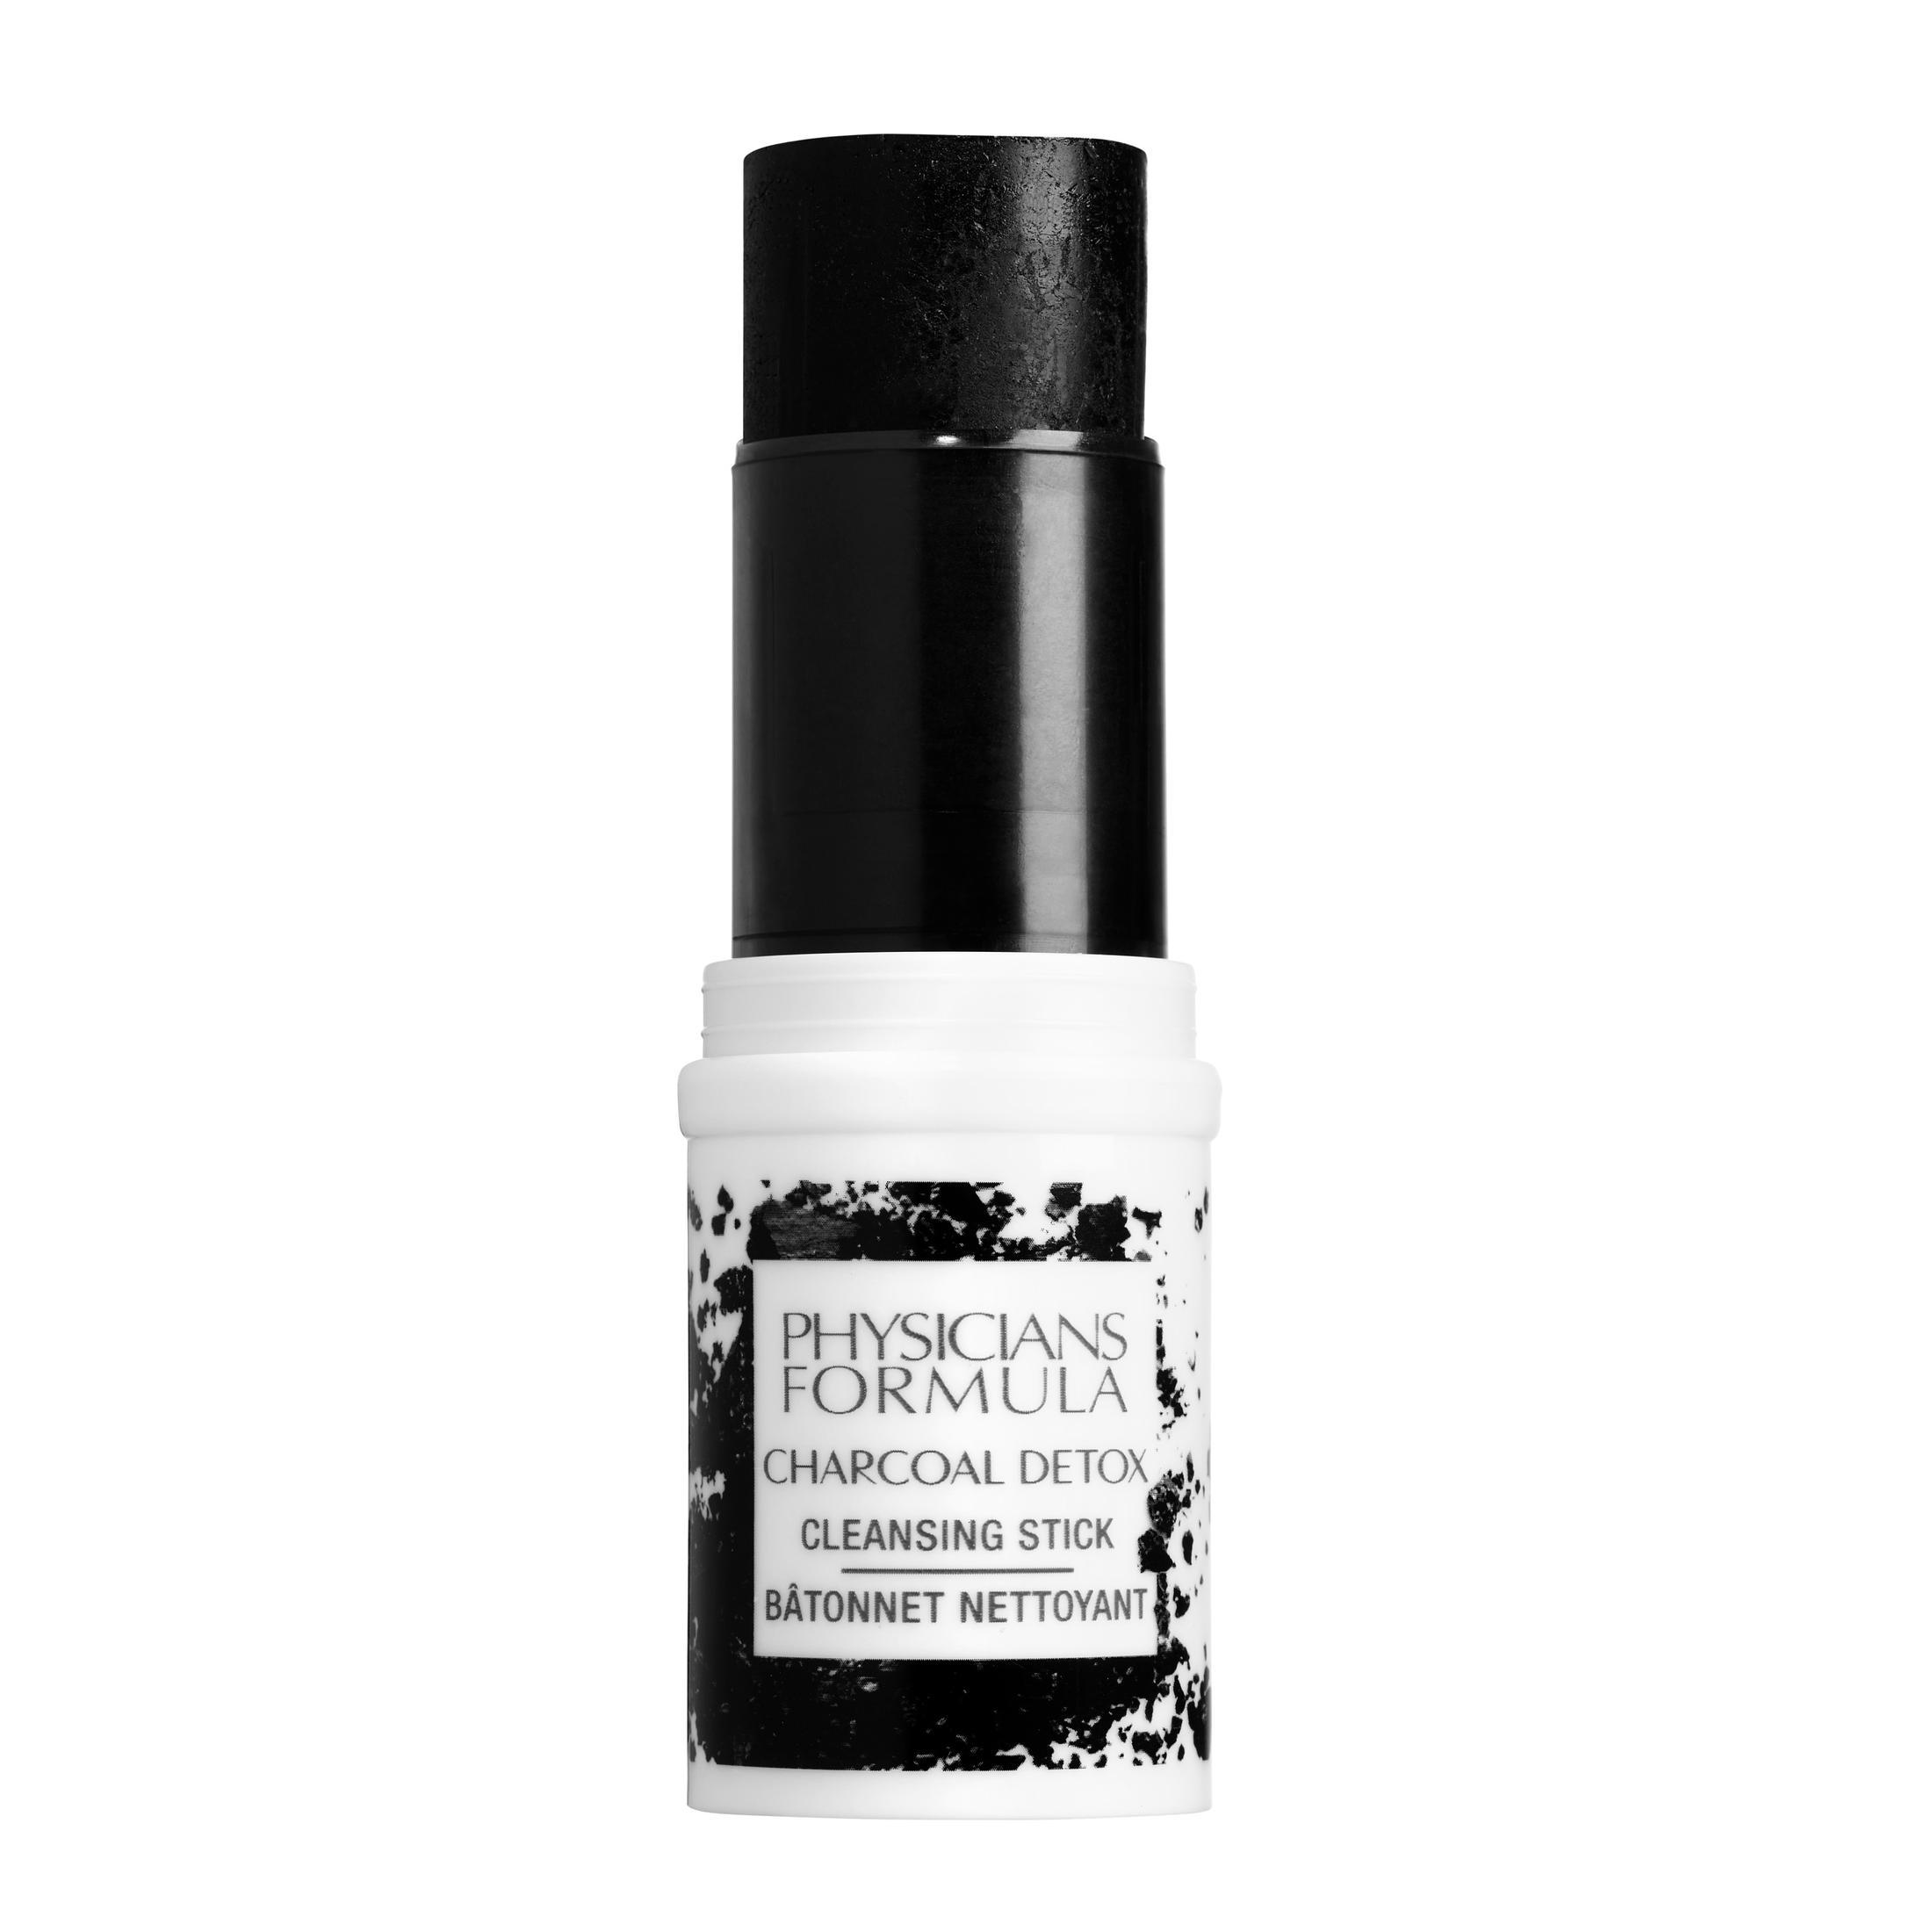 Physicians formula Charcoal Detox Cleansing Stick